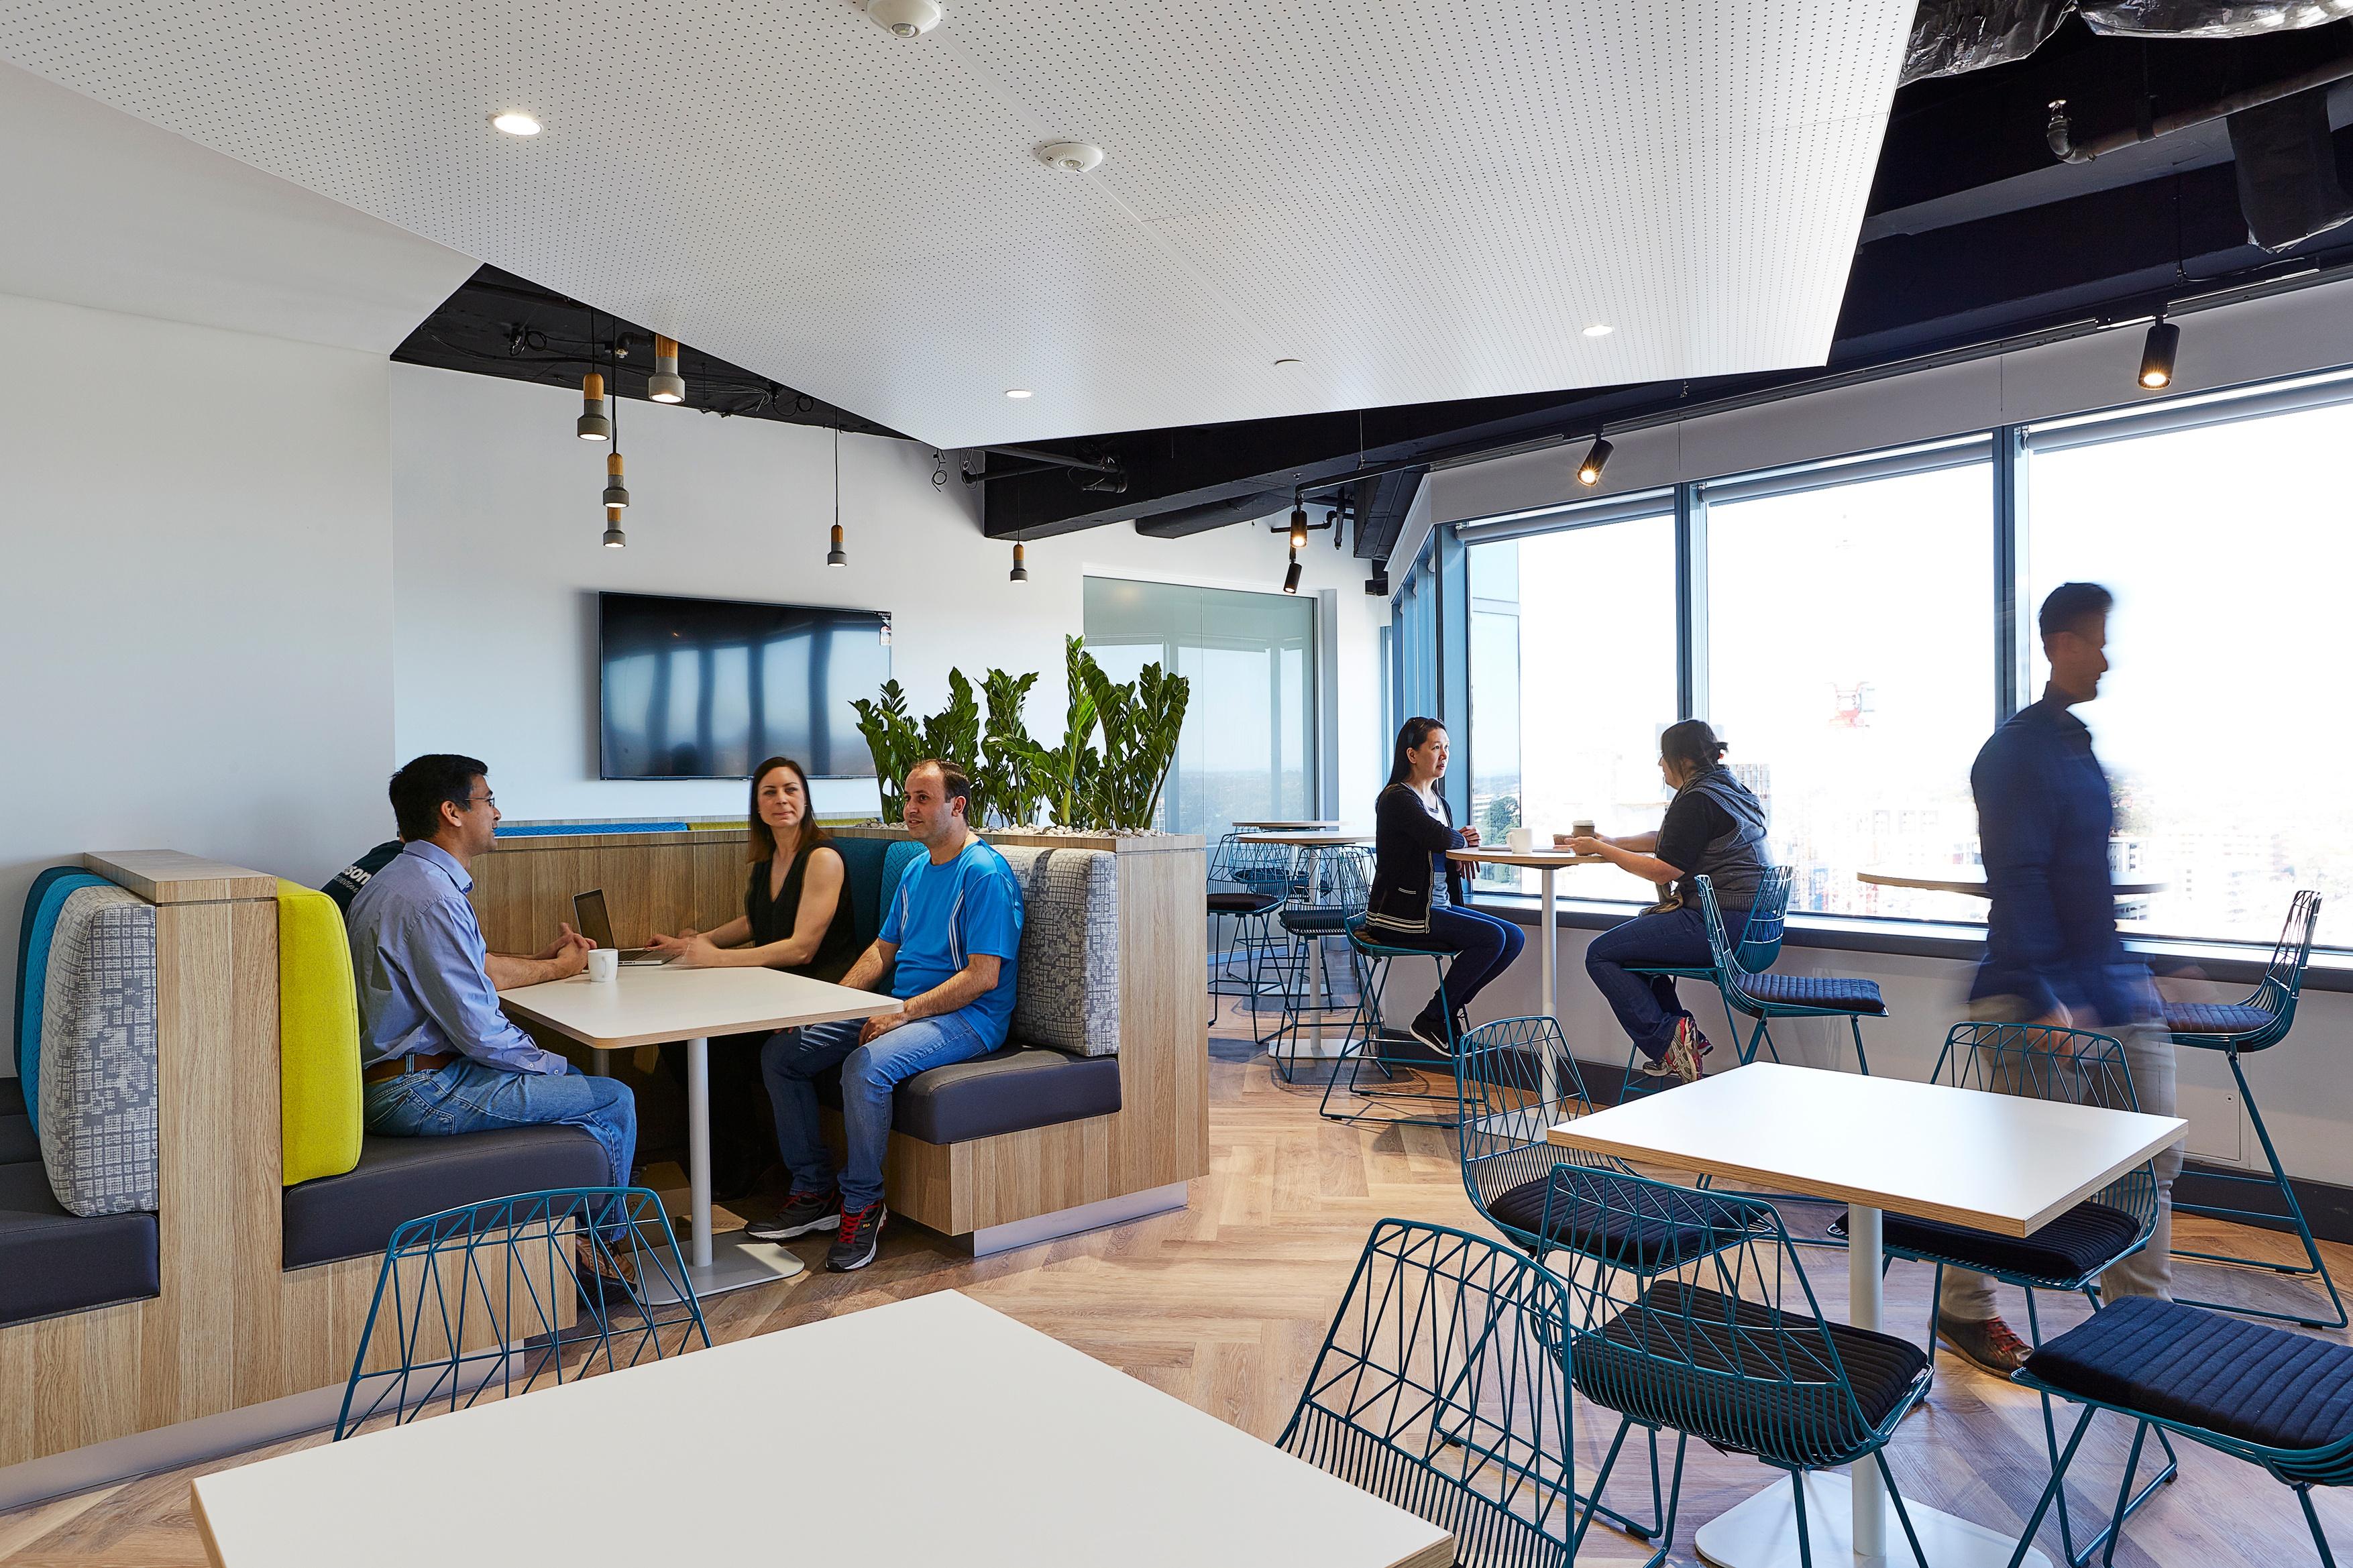 PCG_Hanson_Office Design Trend by PCG